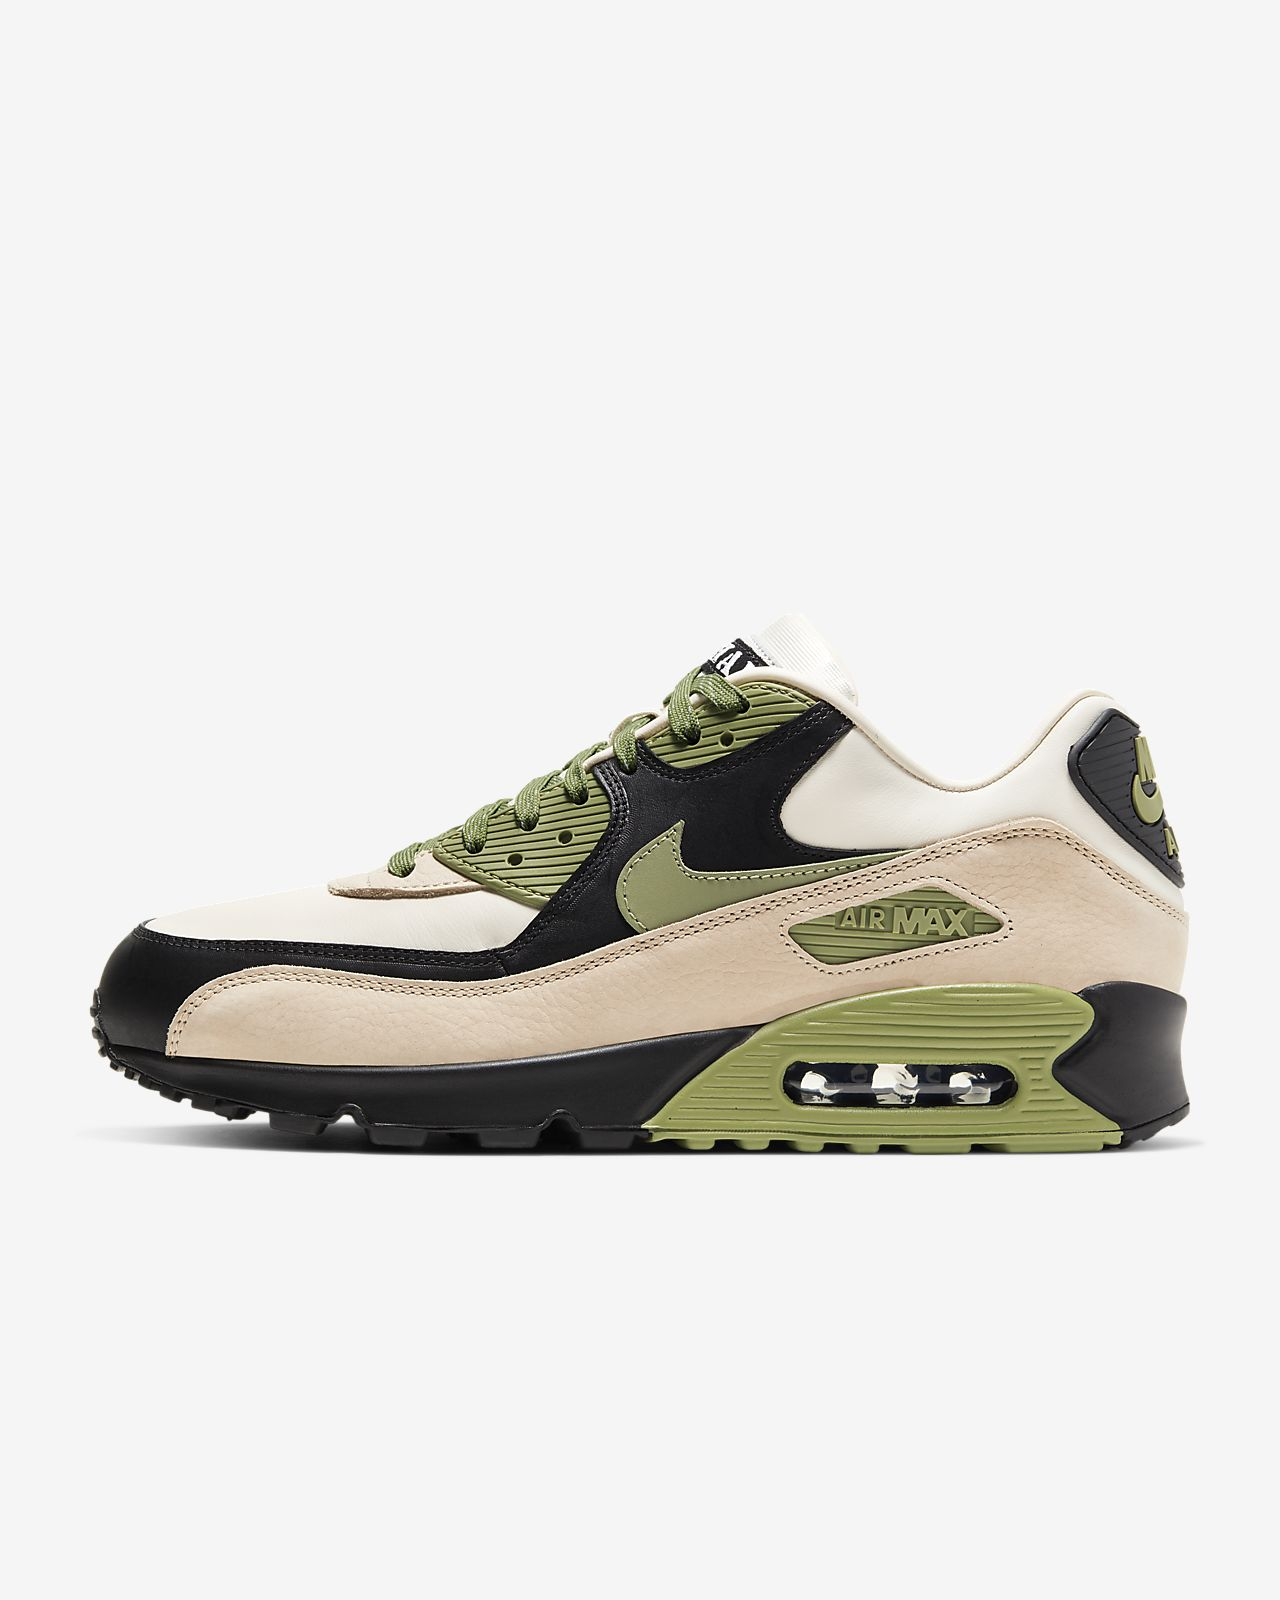 NIKE Official]Nike Air Max 90 Shoe